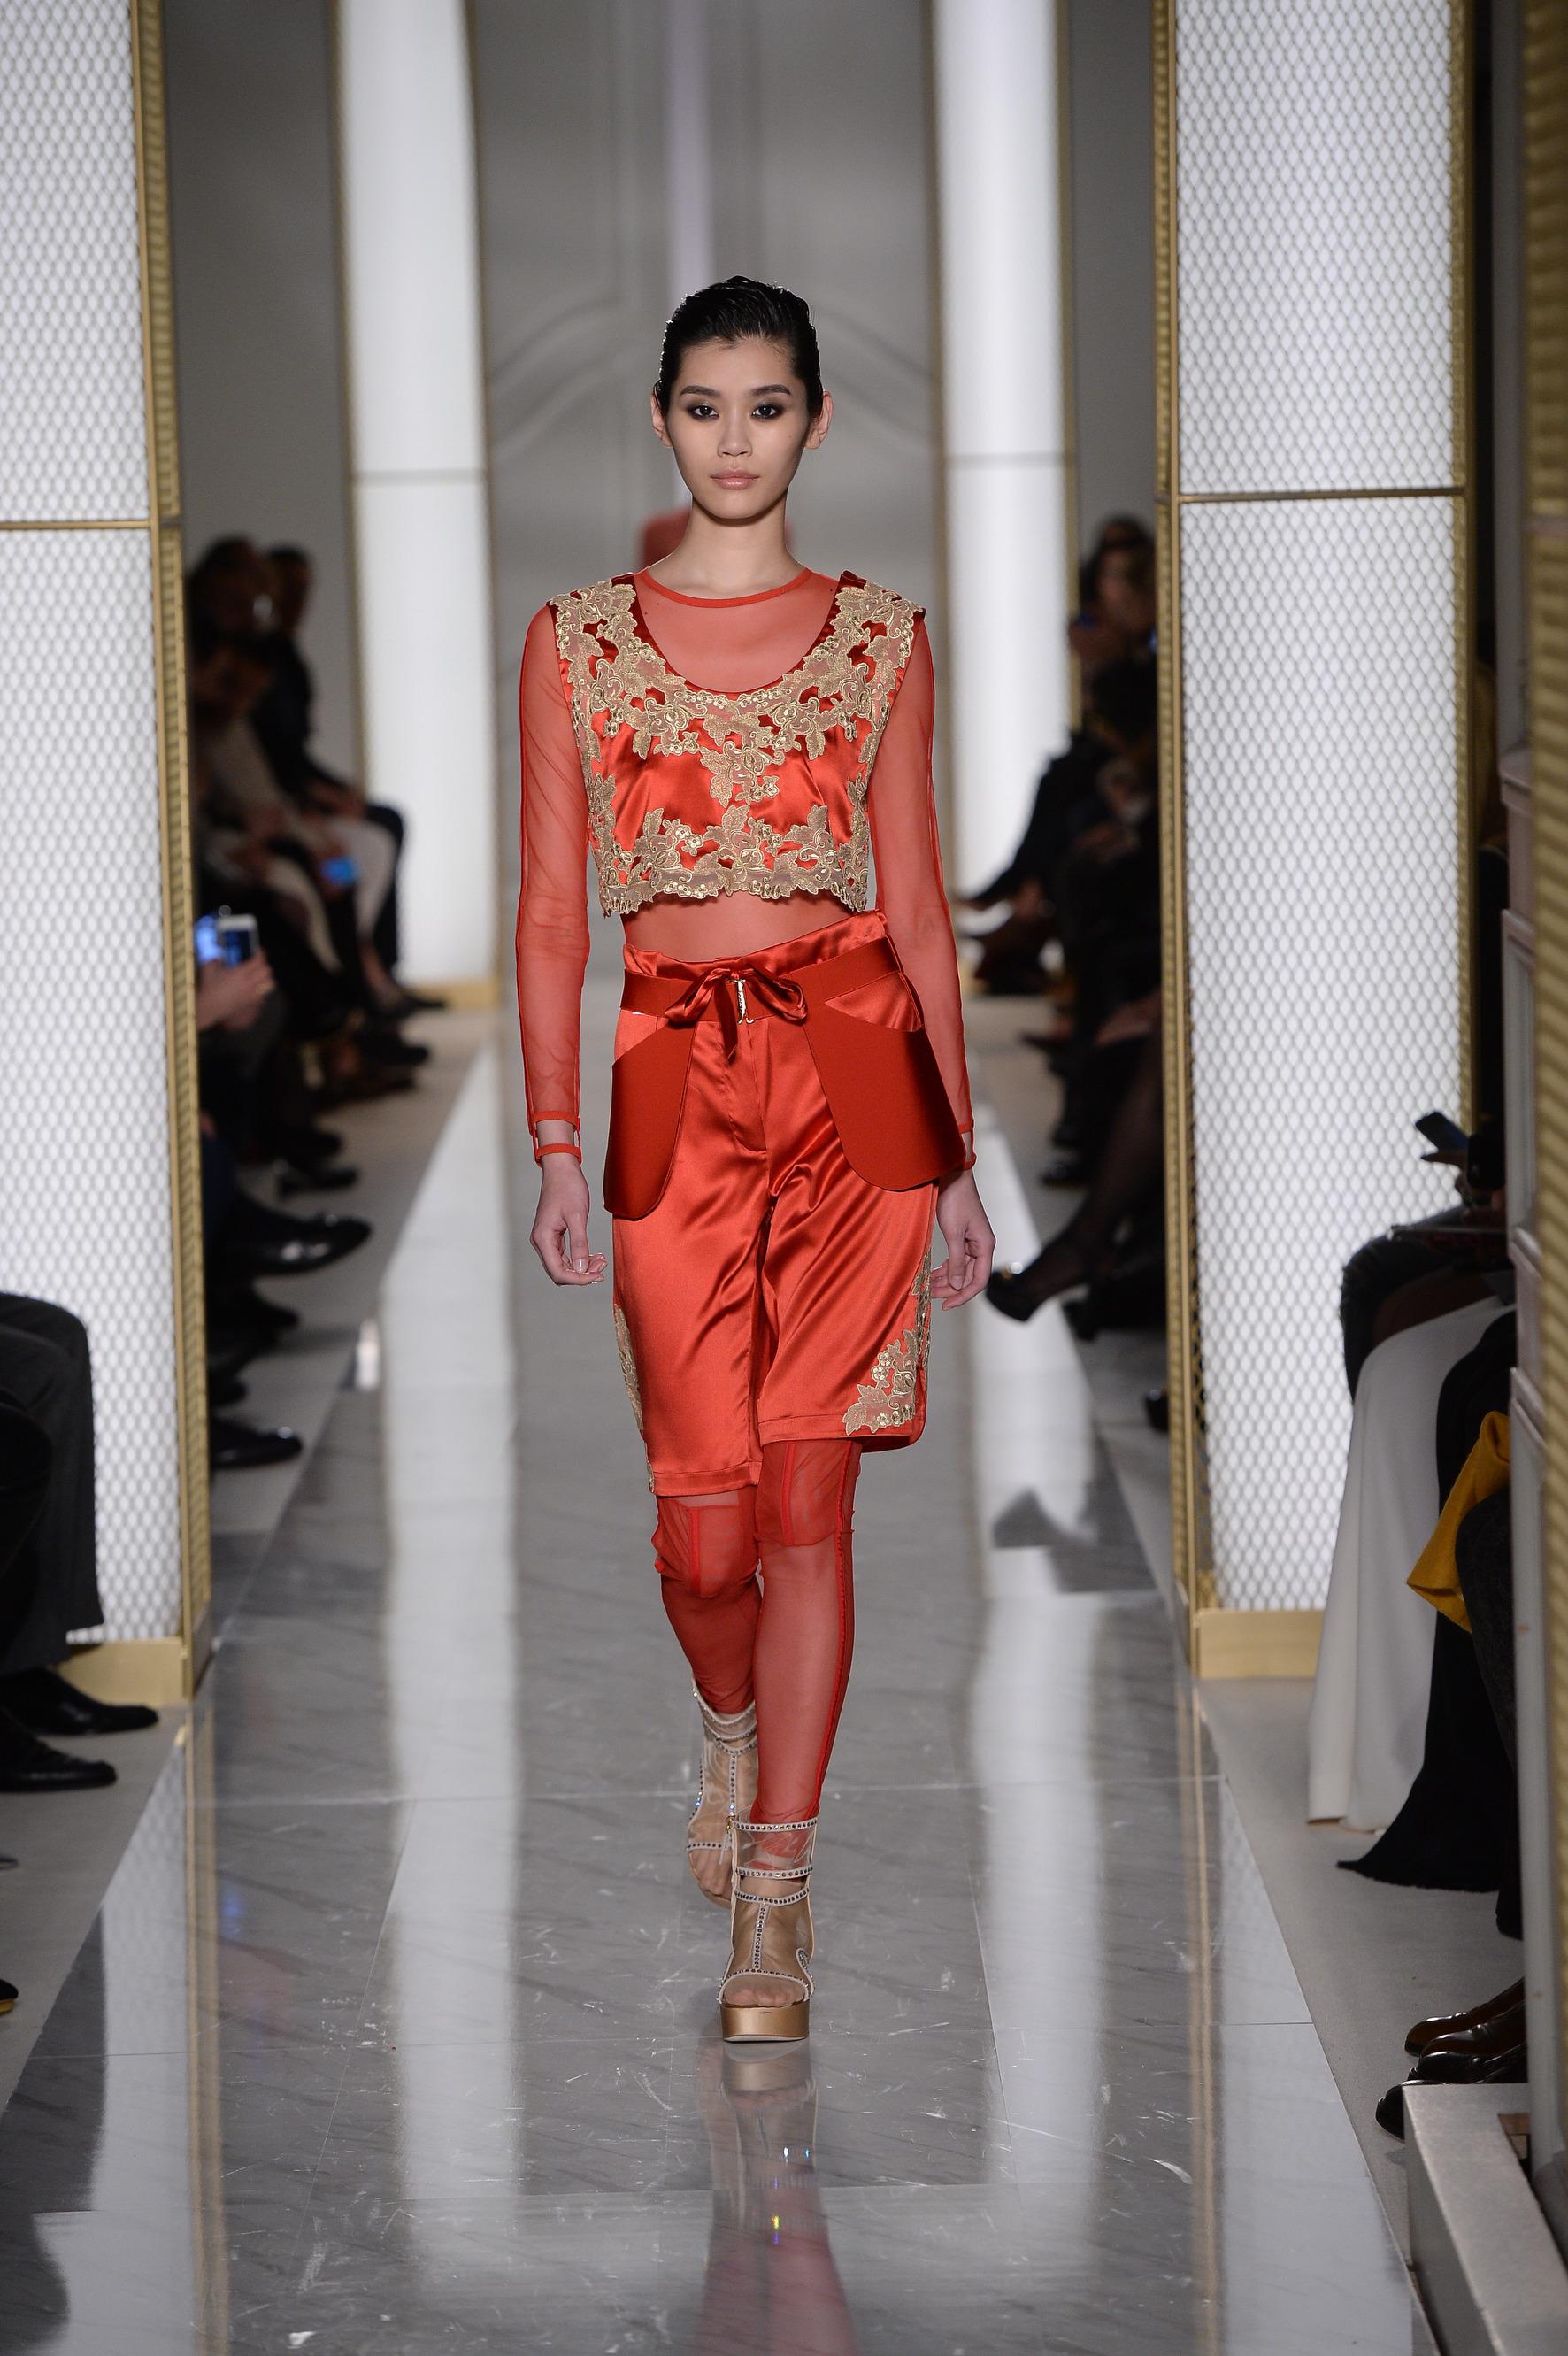 La Perla Atelier Couture Spring 2015 - Daily Front Row ea32db936